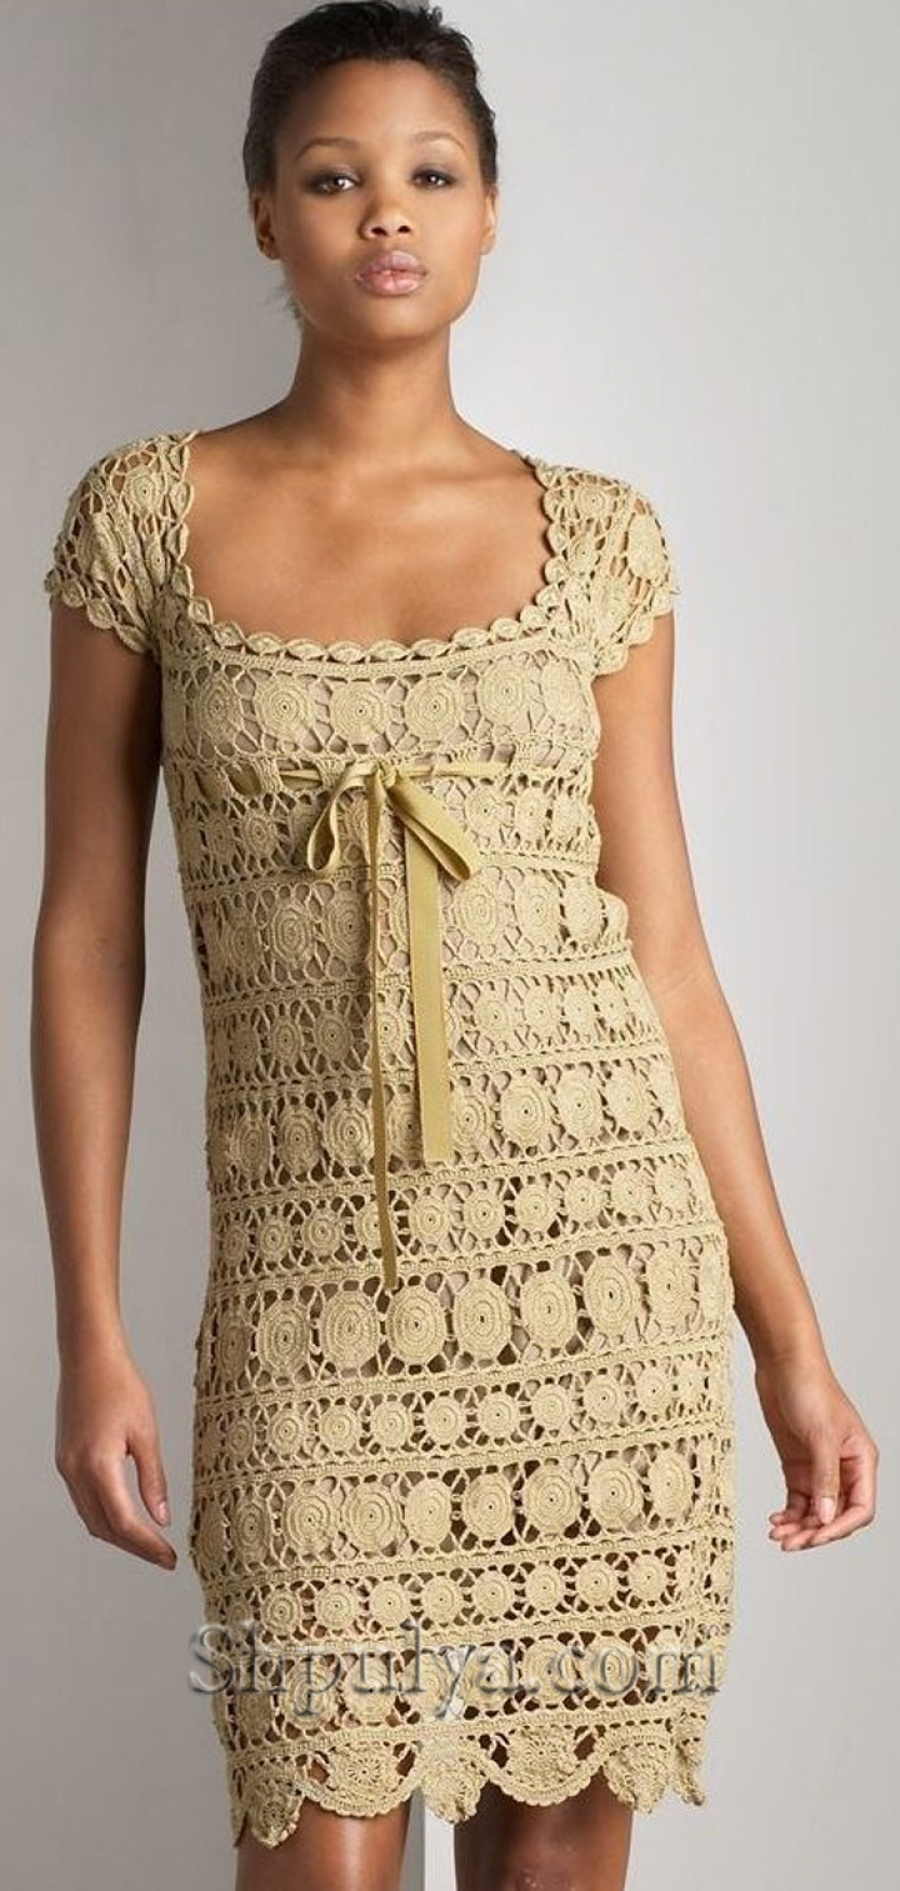 Ажурное платье крючком - SHPULYA.com #hochzeitskleiderhäkeln Ажурное платье крючком - SHPULYA.com #hochzeitskleiderhäkeln